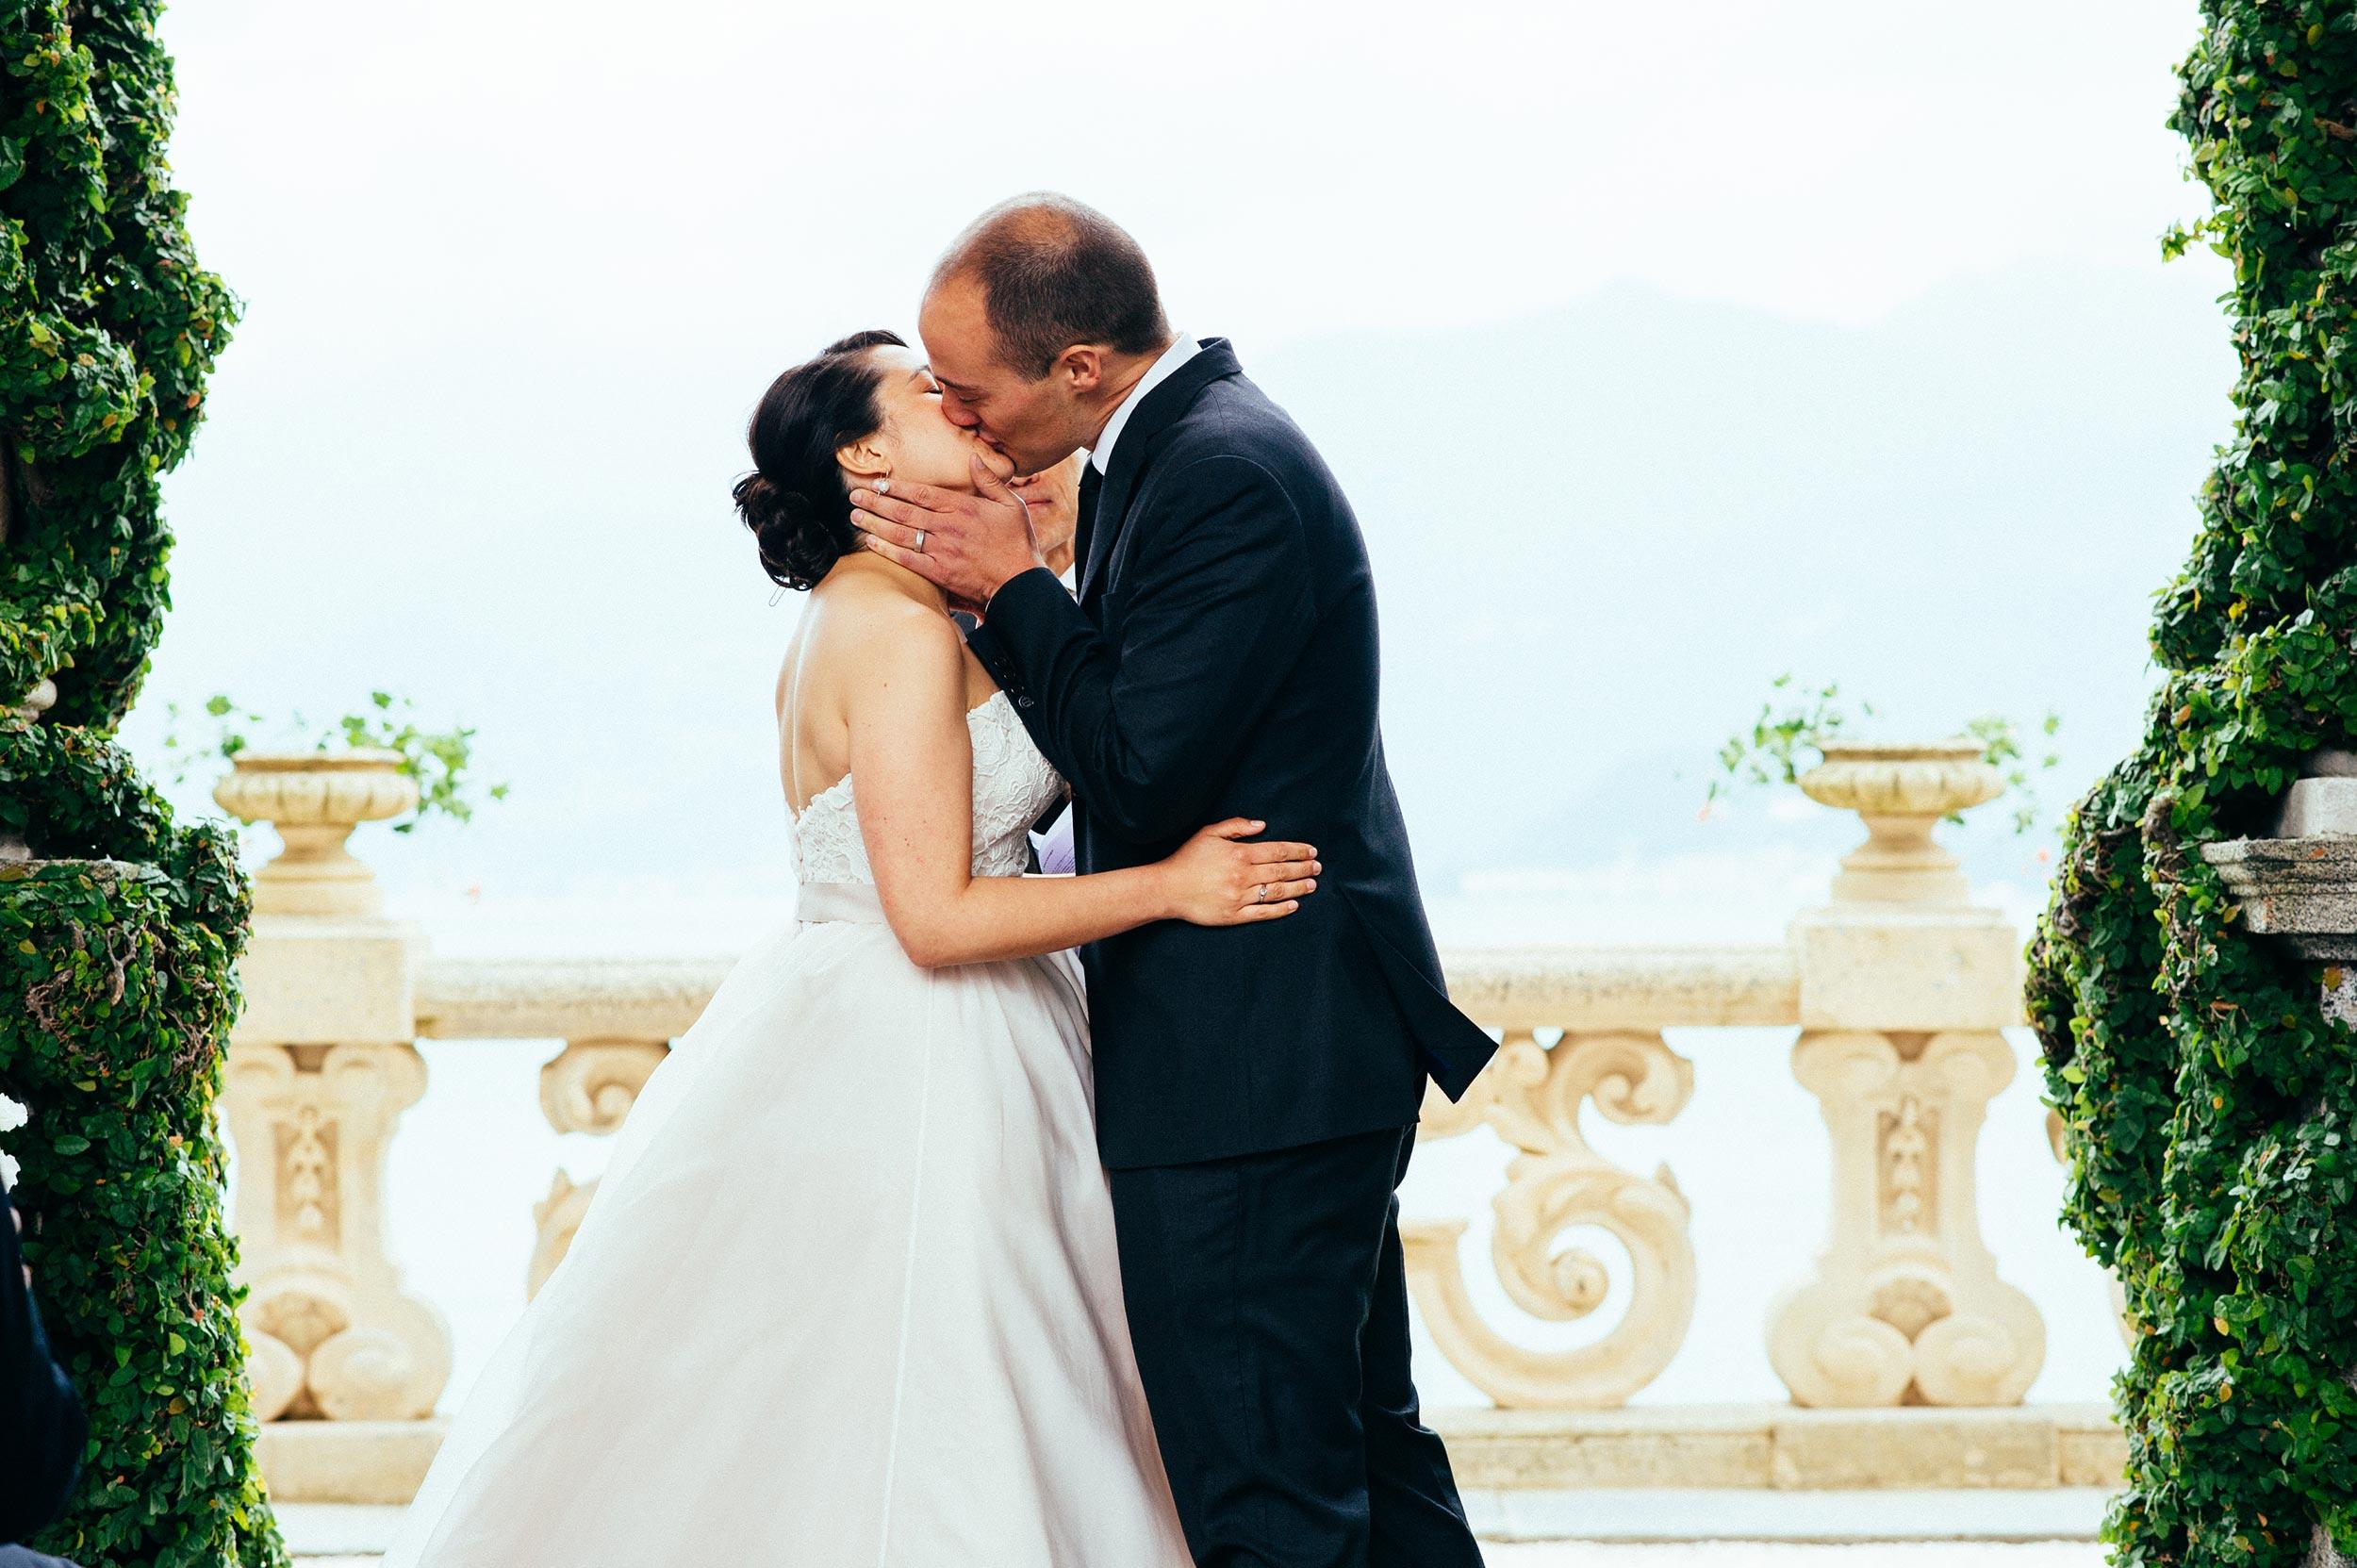 2015-Jon-Lauren-Bellagio-Lake-Como-Wedding-Photographer-Italy-Alessandro-Avenali-29.jpg